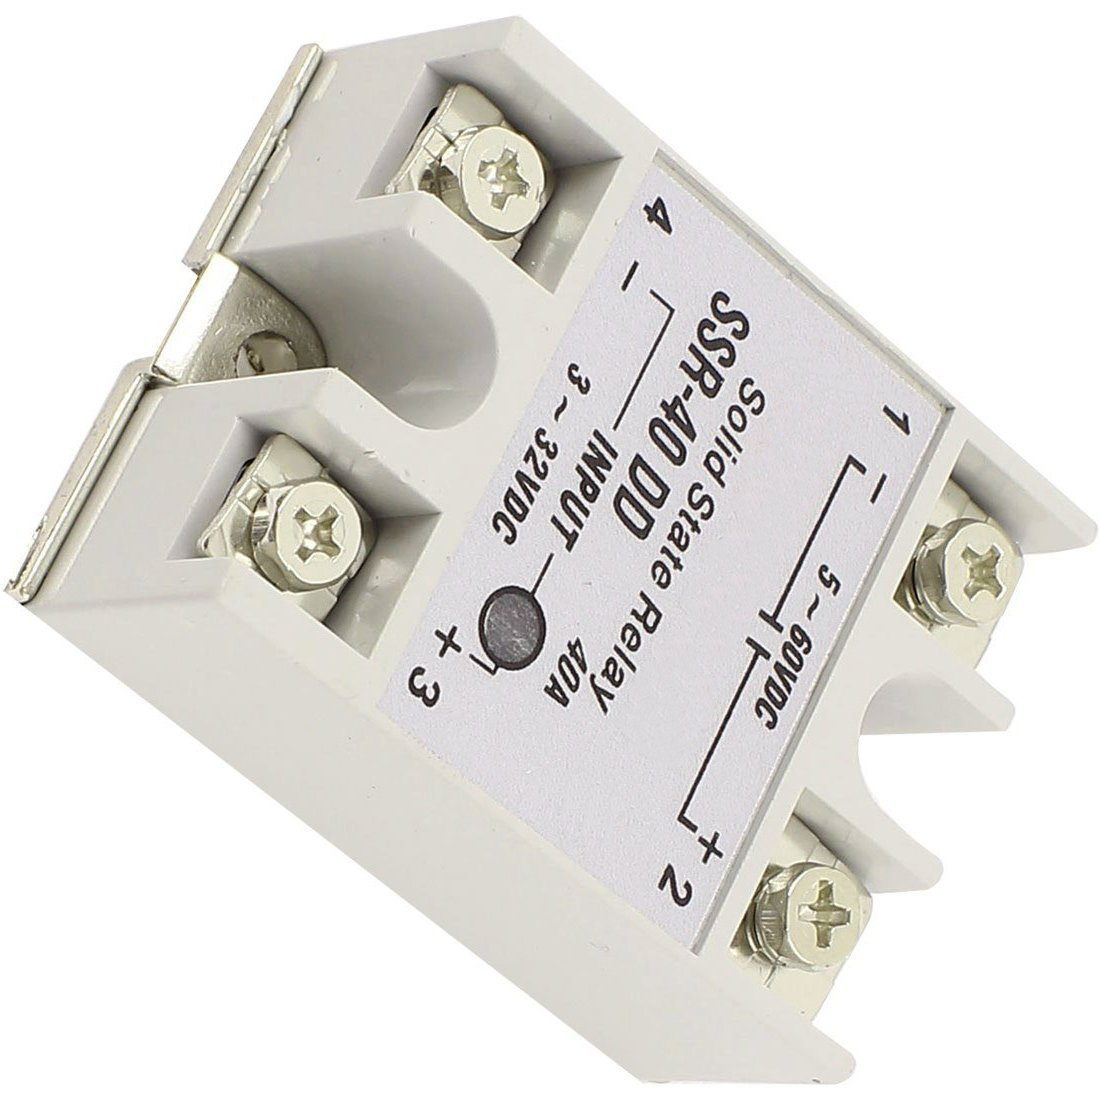 Ssr 40dd Solid State Relay Toogoorsingle Phase Reprap Dc 40a Dc3 32v Dc5 60v White Silver